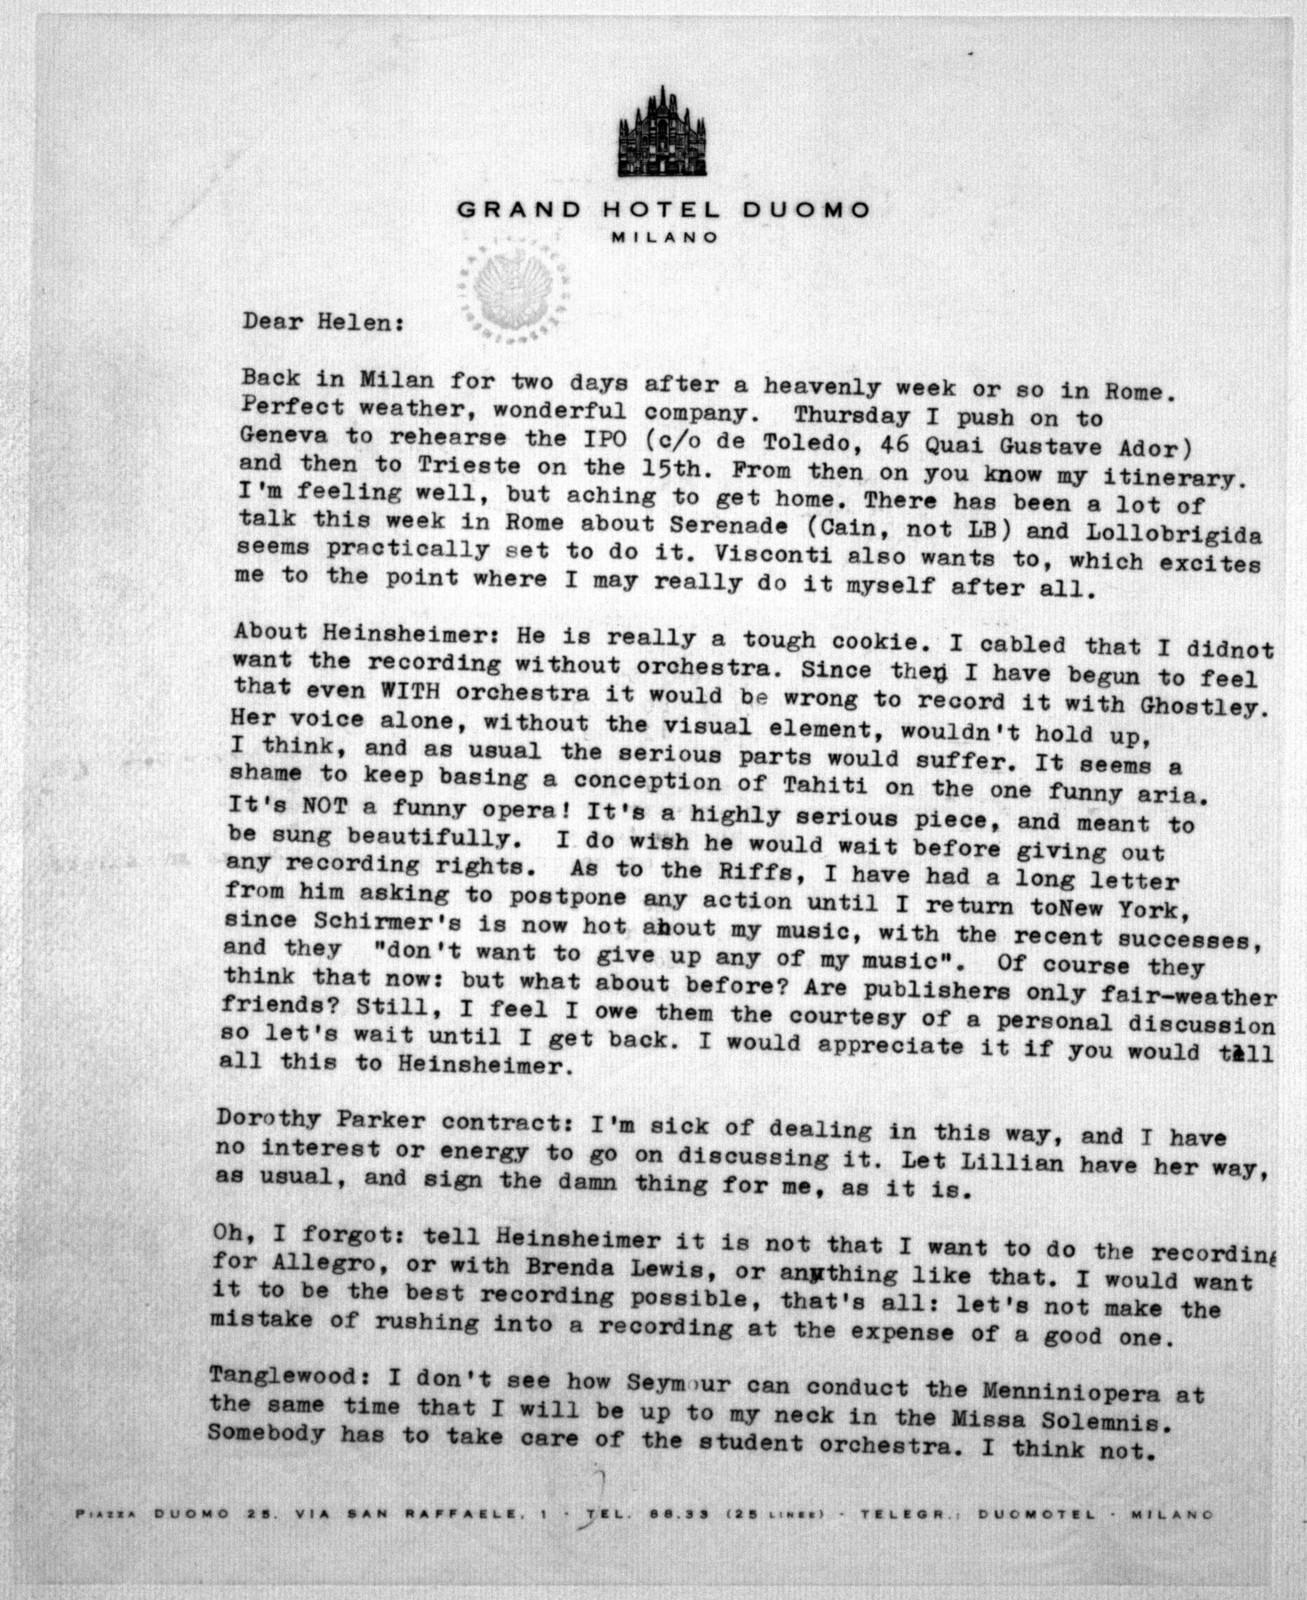 Letter from Leonard Bernstein to Helen Coates, 1955